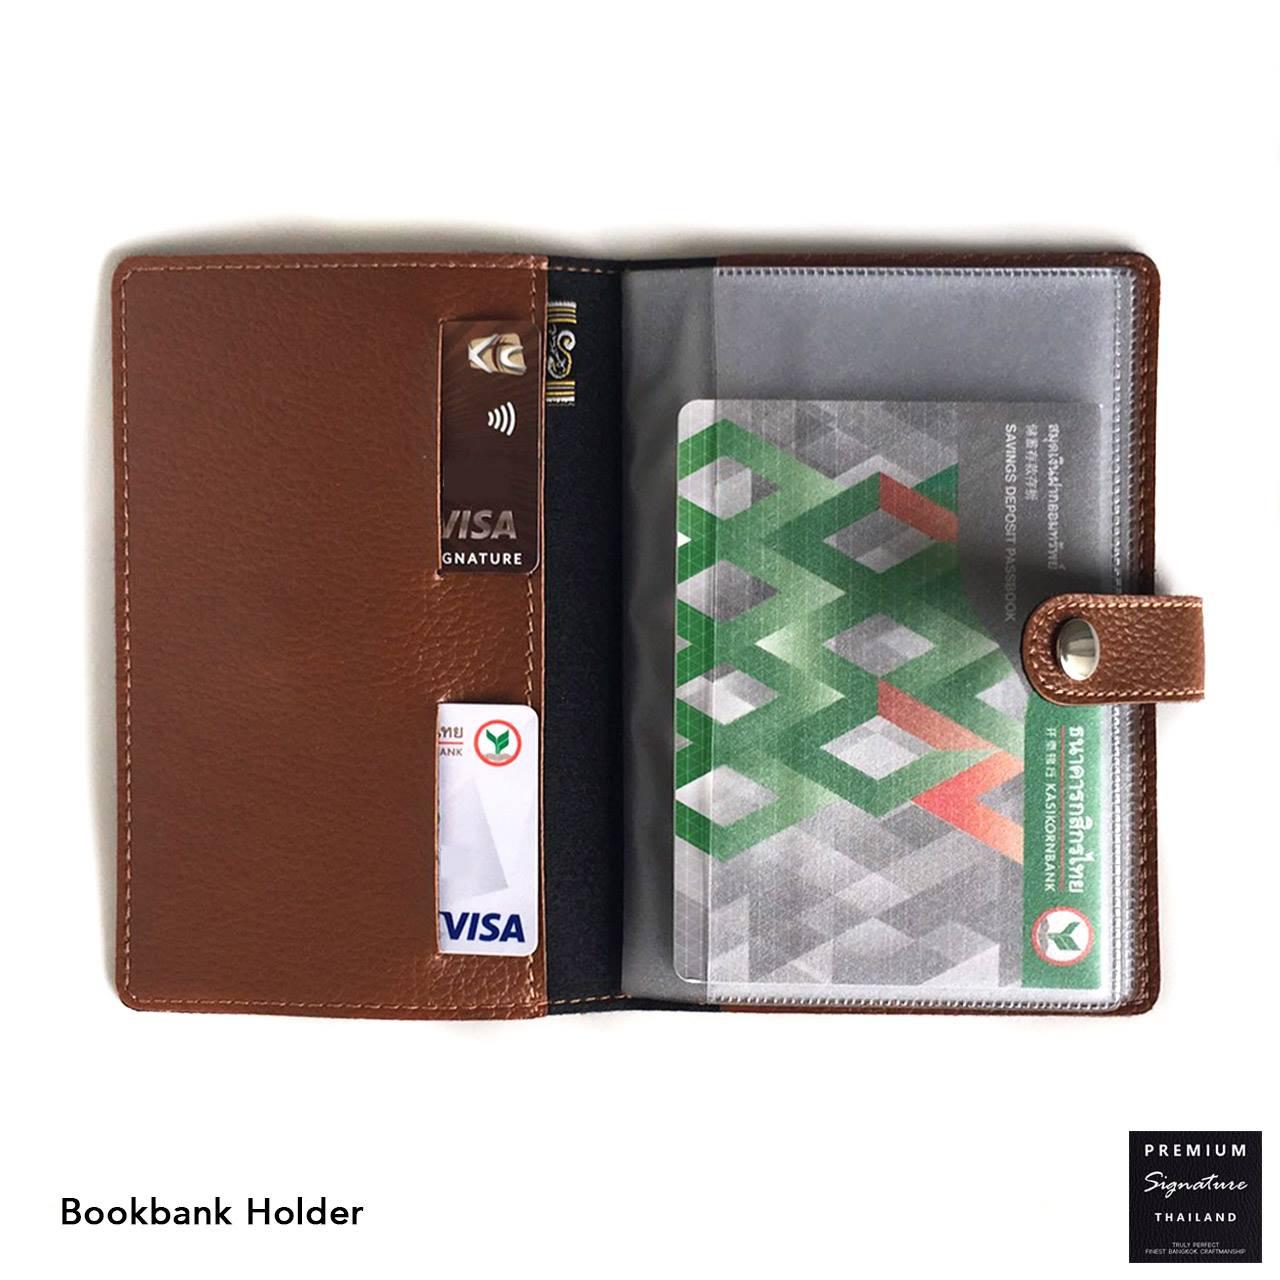 The Signature Bookbank Holder▪ กระเป๋าใส่สมุดบัญชีธนาคาร